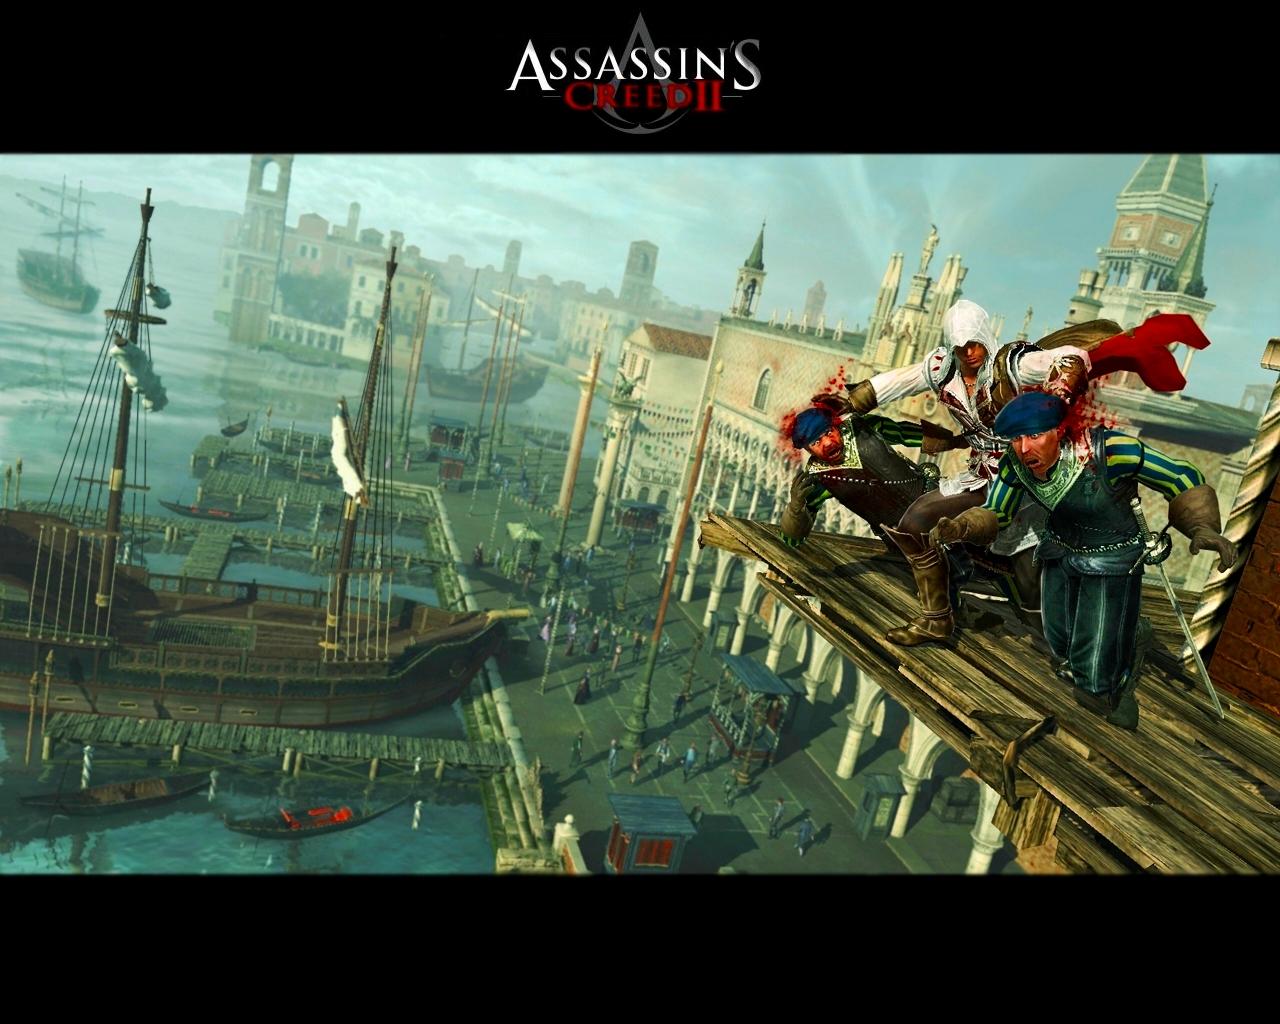 download assassins creed 2 - 1280×720